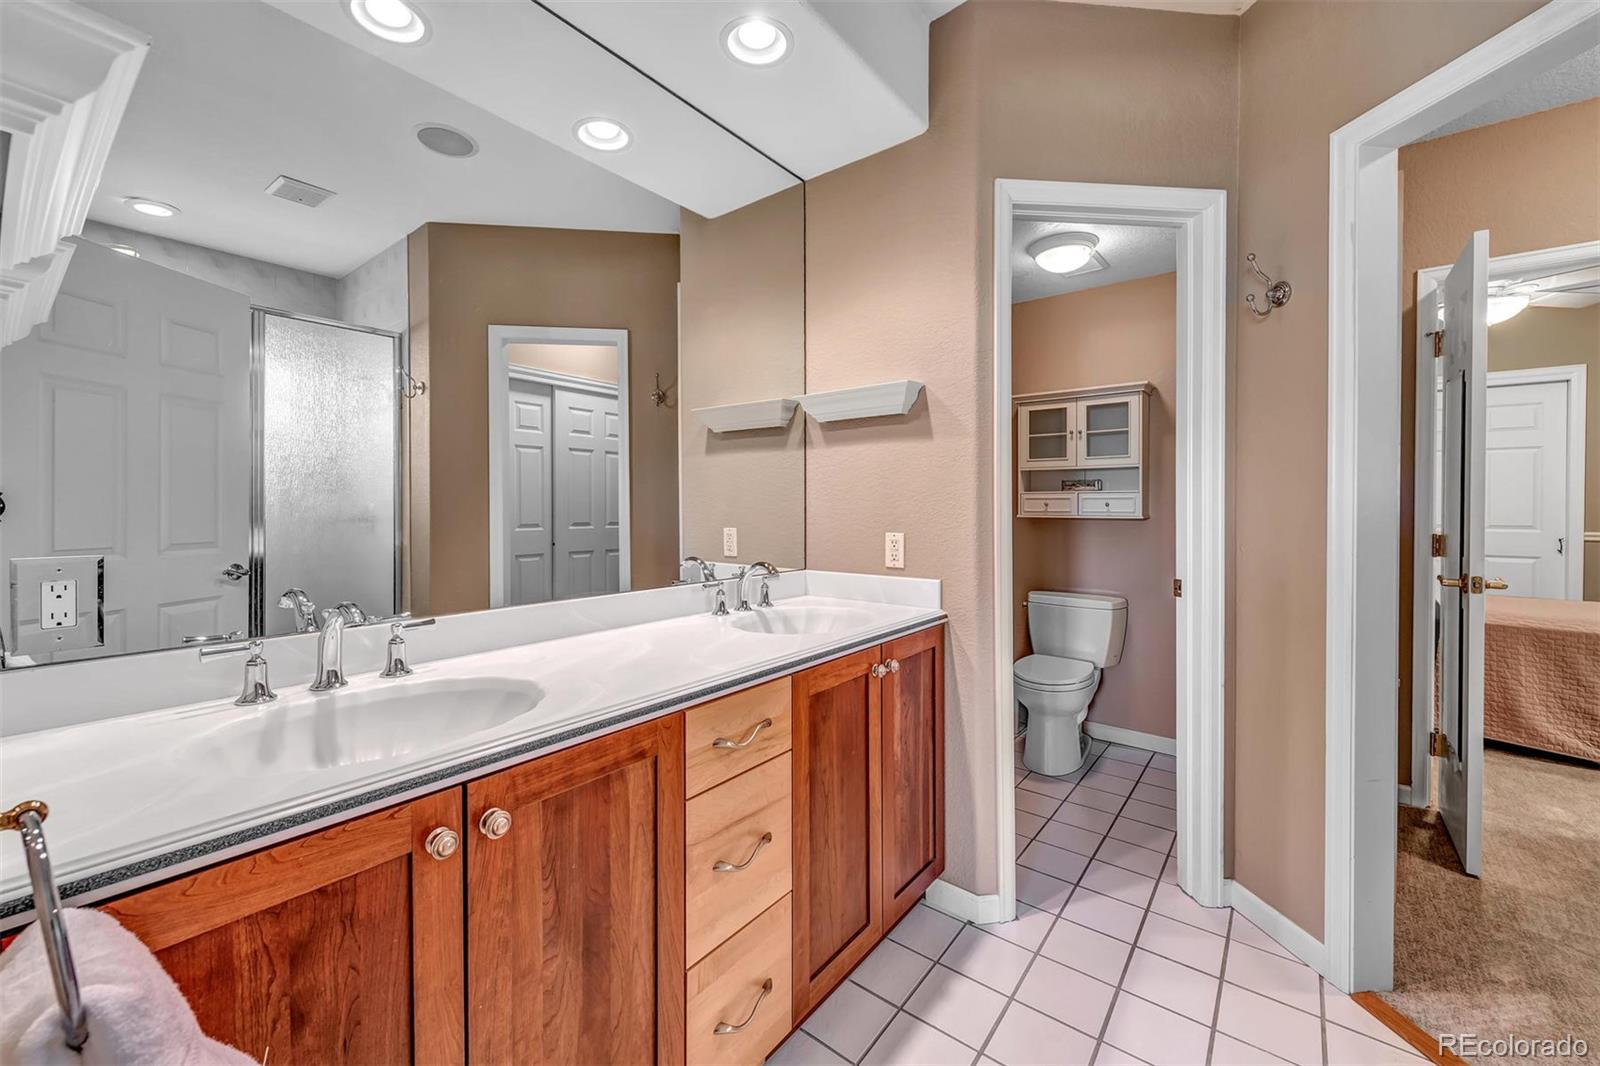 MLS# 2218471 - 32 - 2441 S Xenon Way, Lakewood, CO 80228